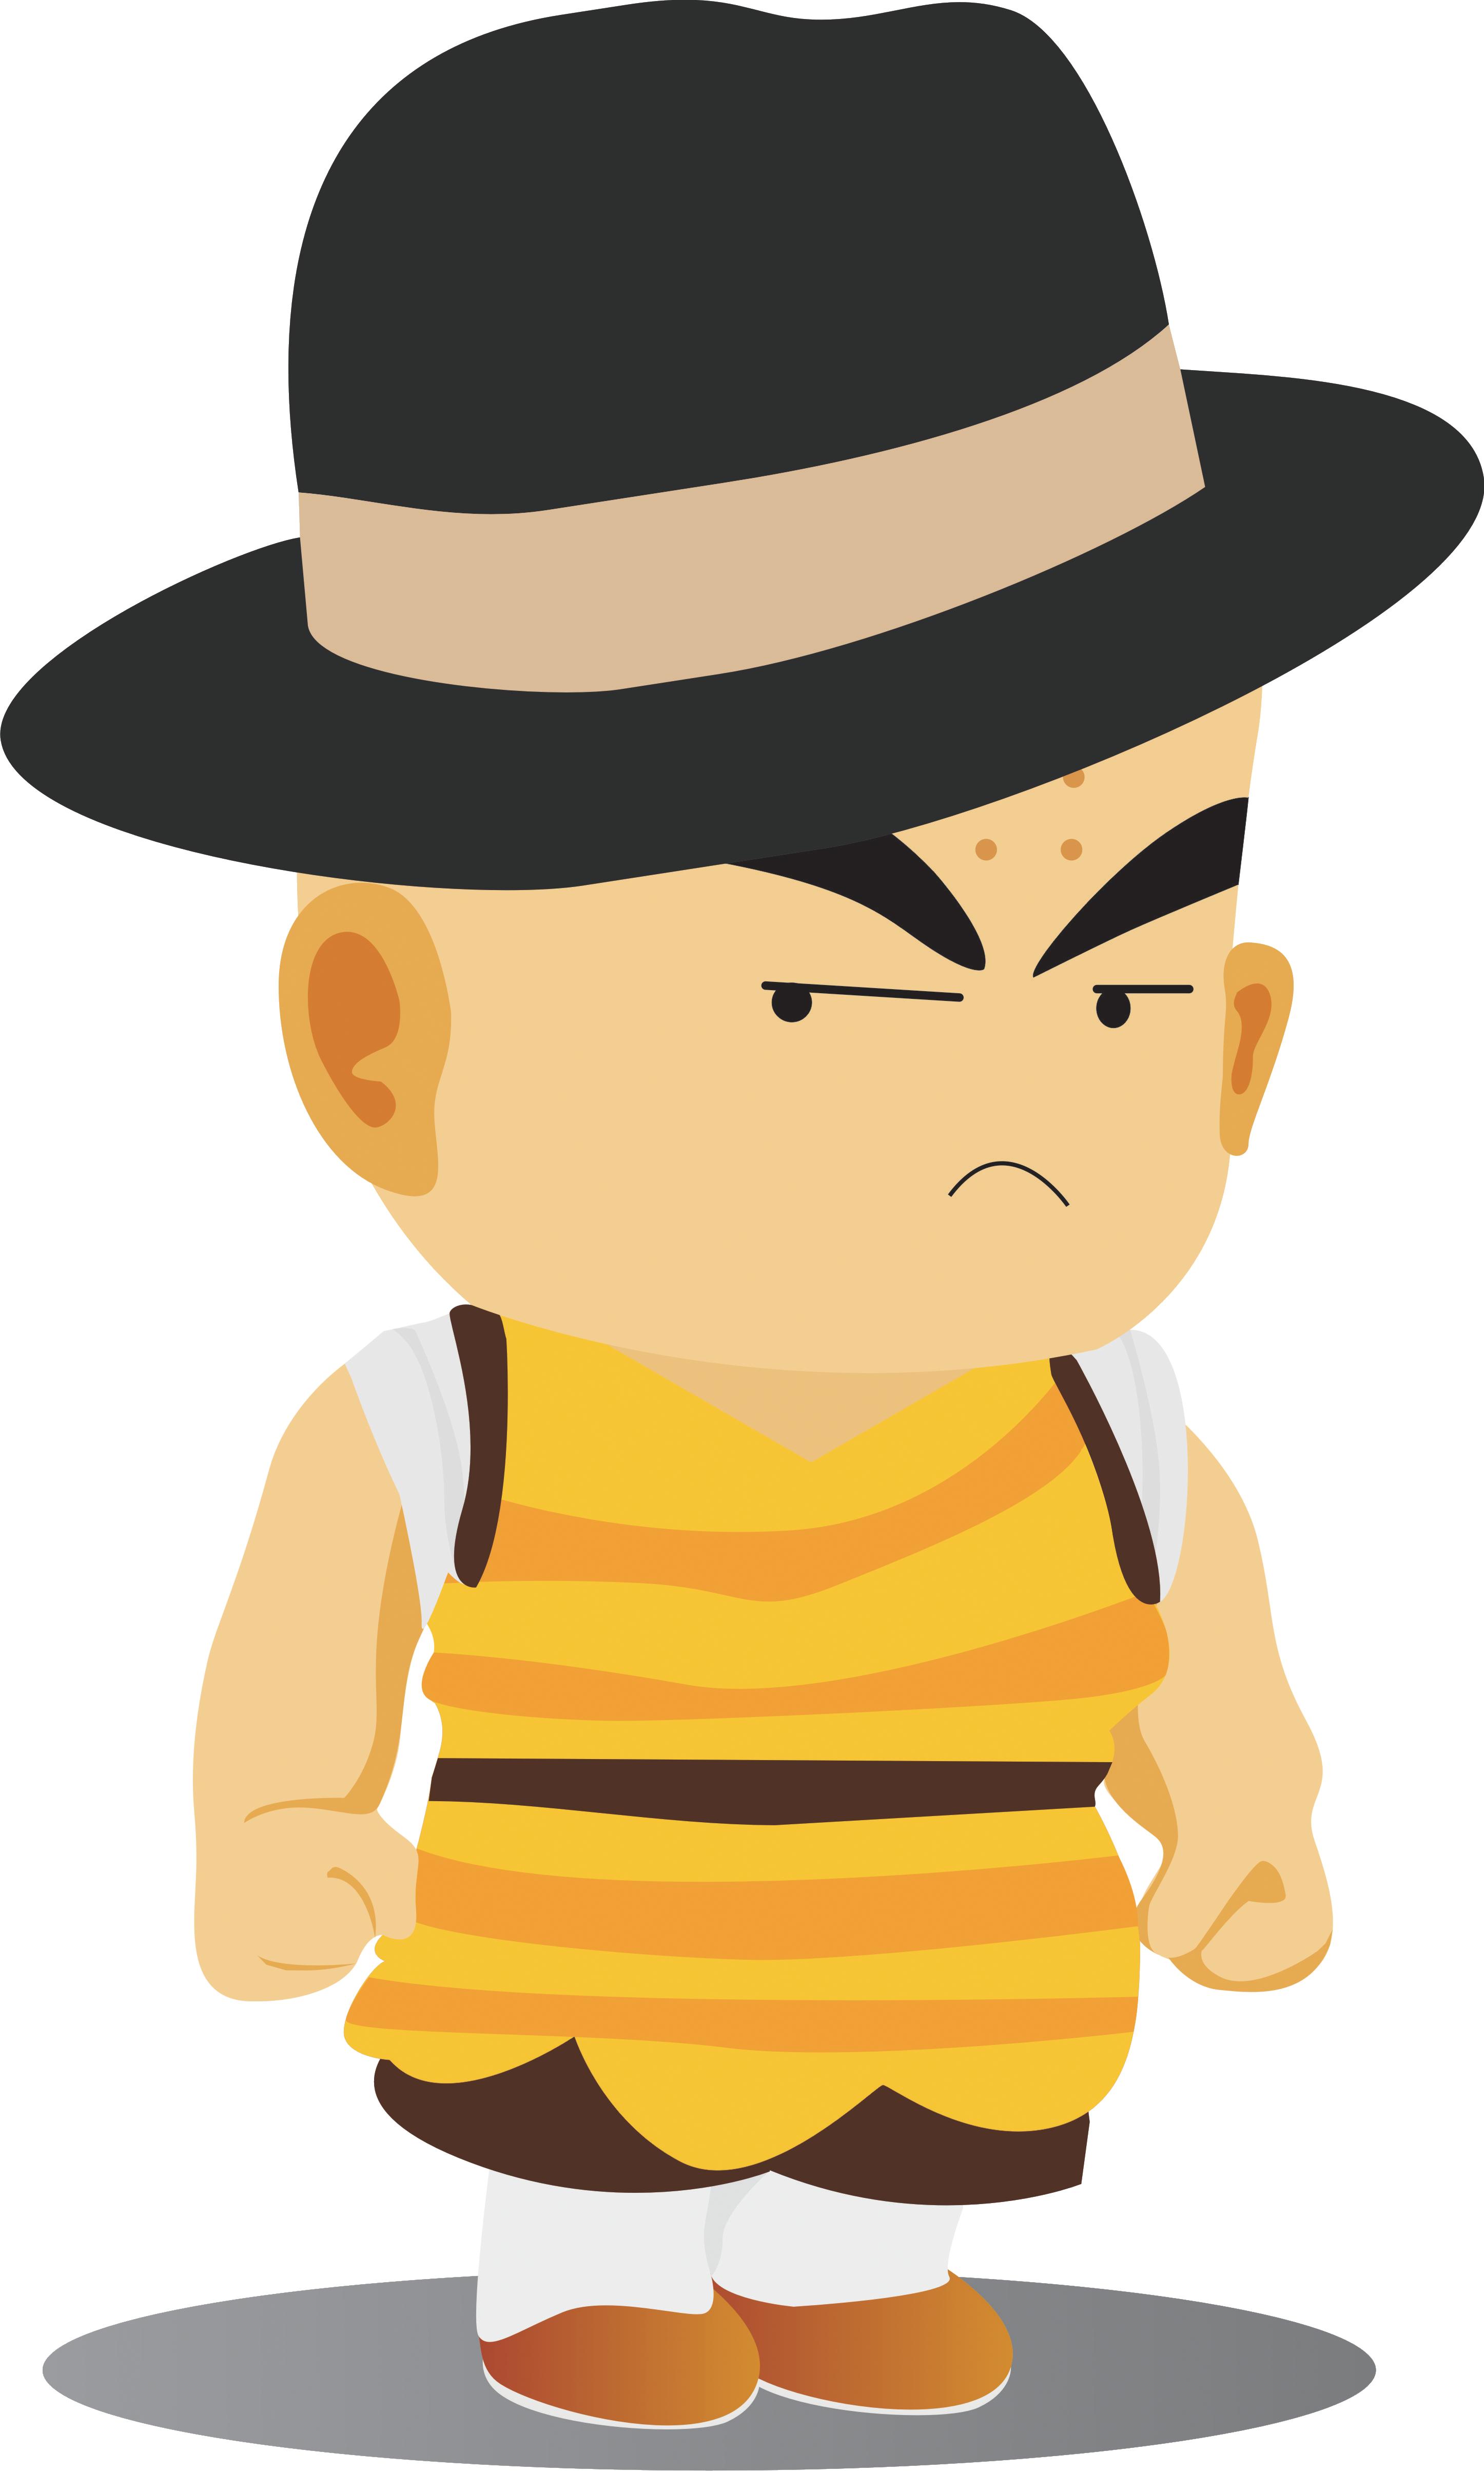 Fedora clipart spy hat. Monk company man